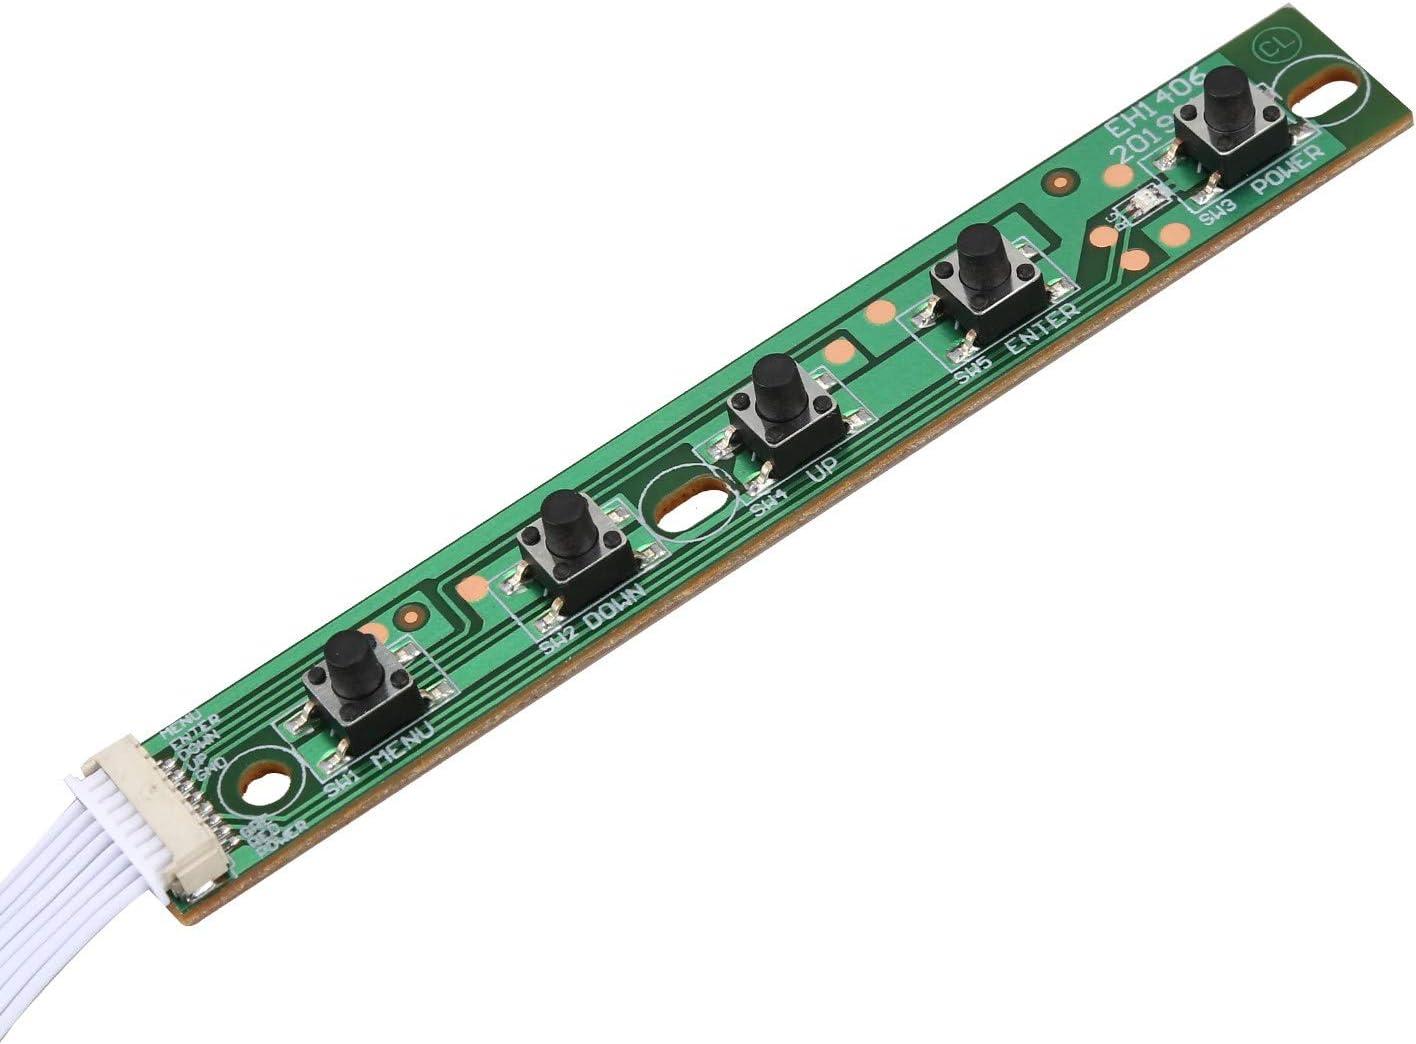 Nrpfell PCB LCD Controller Board Gr/üN 30 Pin EDP HDMI LCD Controller Board 1920X 1080 LED Bildschirm f/ür N173HCE-E31 N173HGE-E11